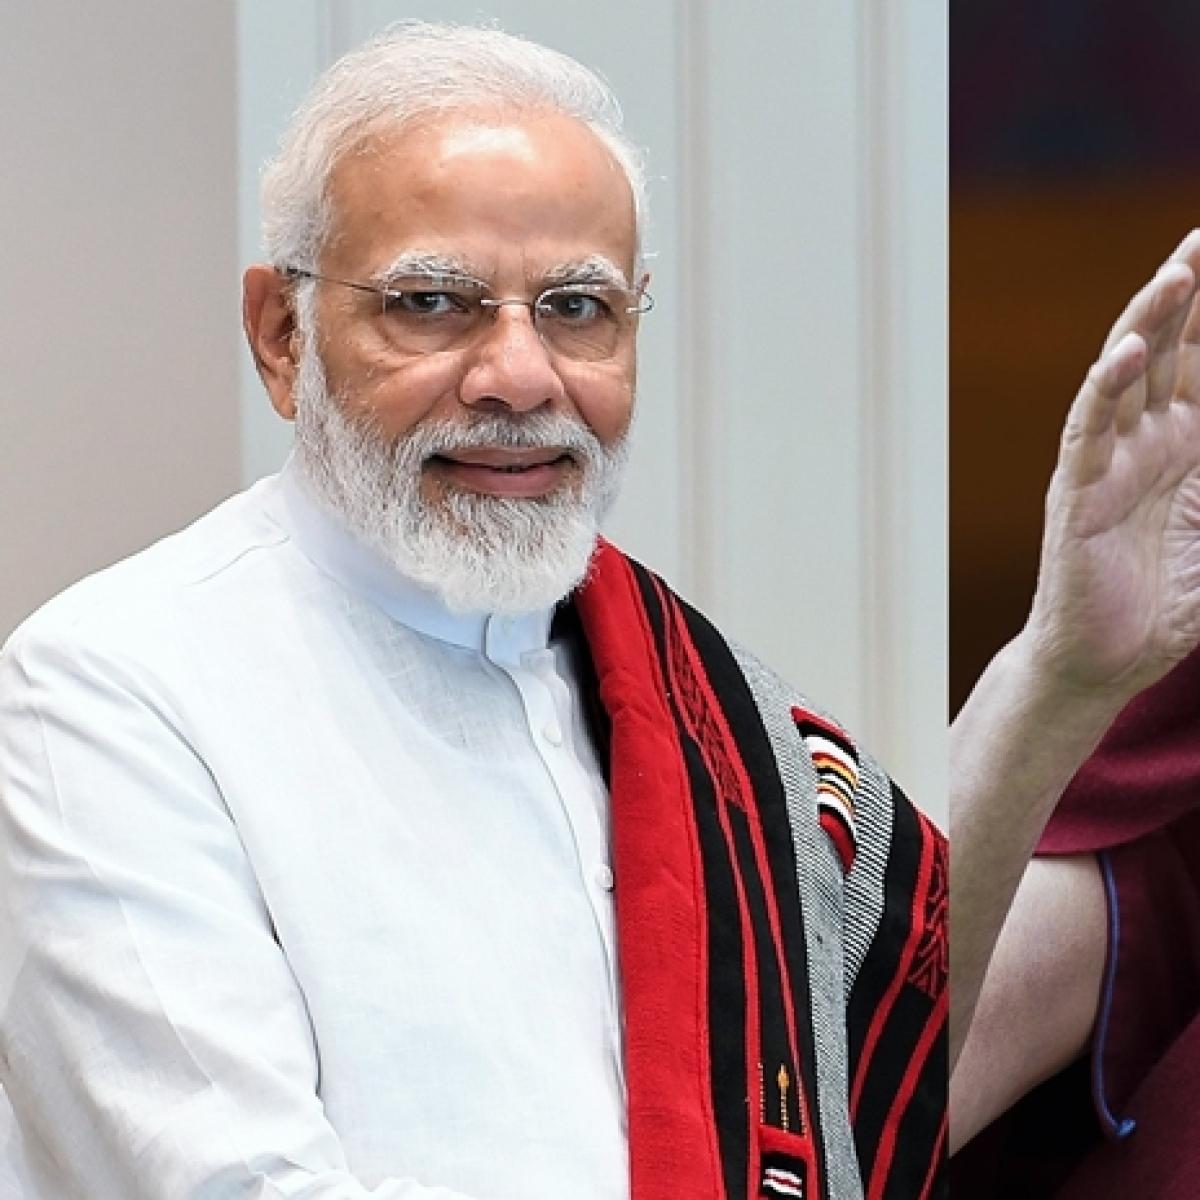 Amid Indo-China tensions, will PM Narendra Modi wish Dalai Lama on his 85th birthday?